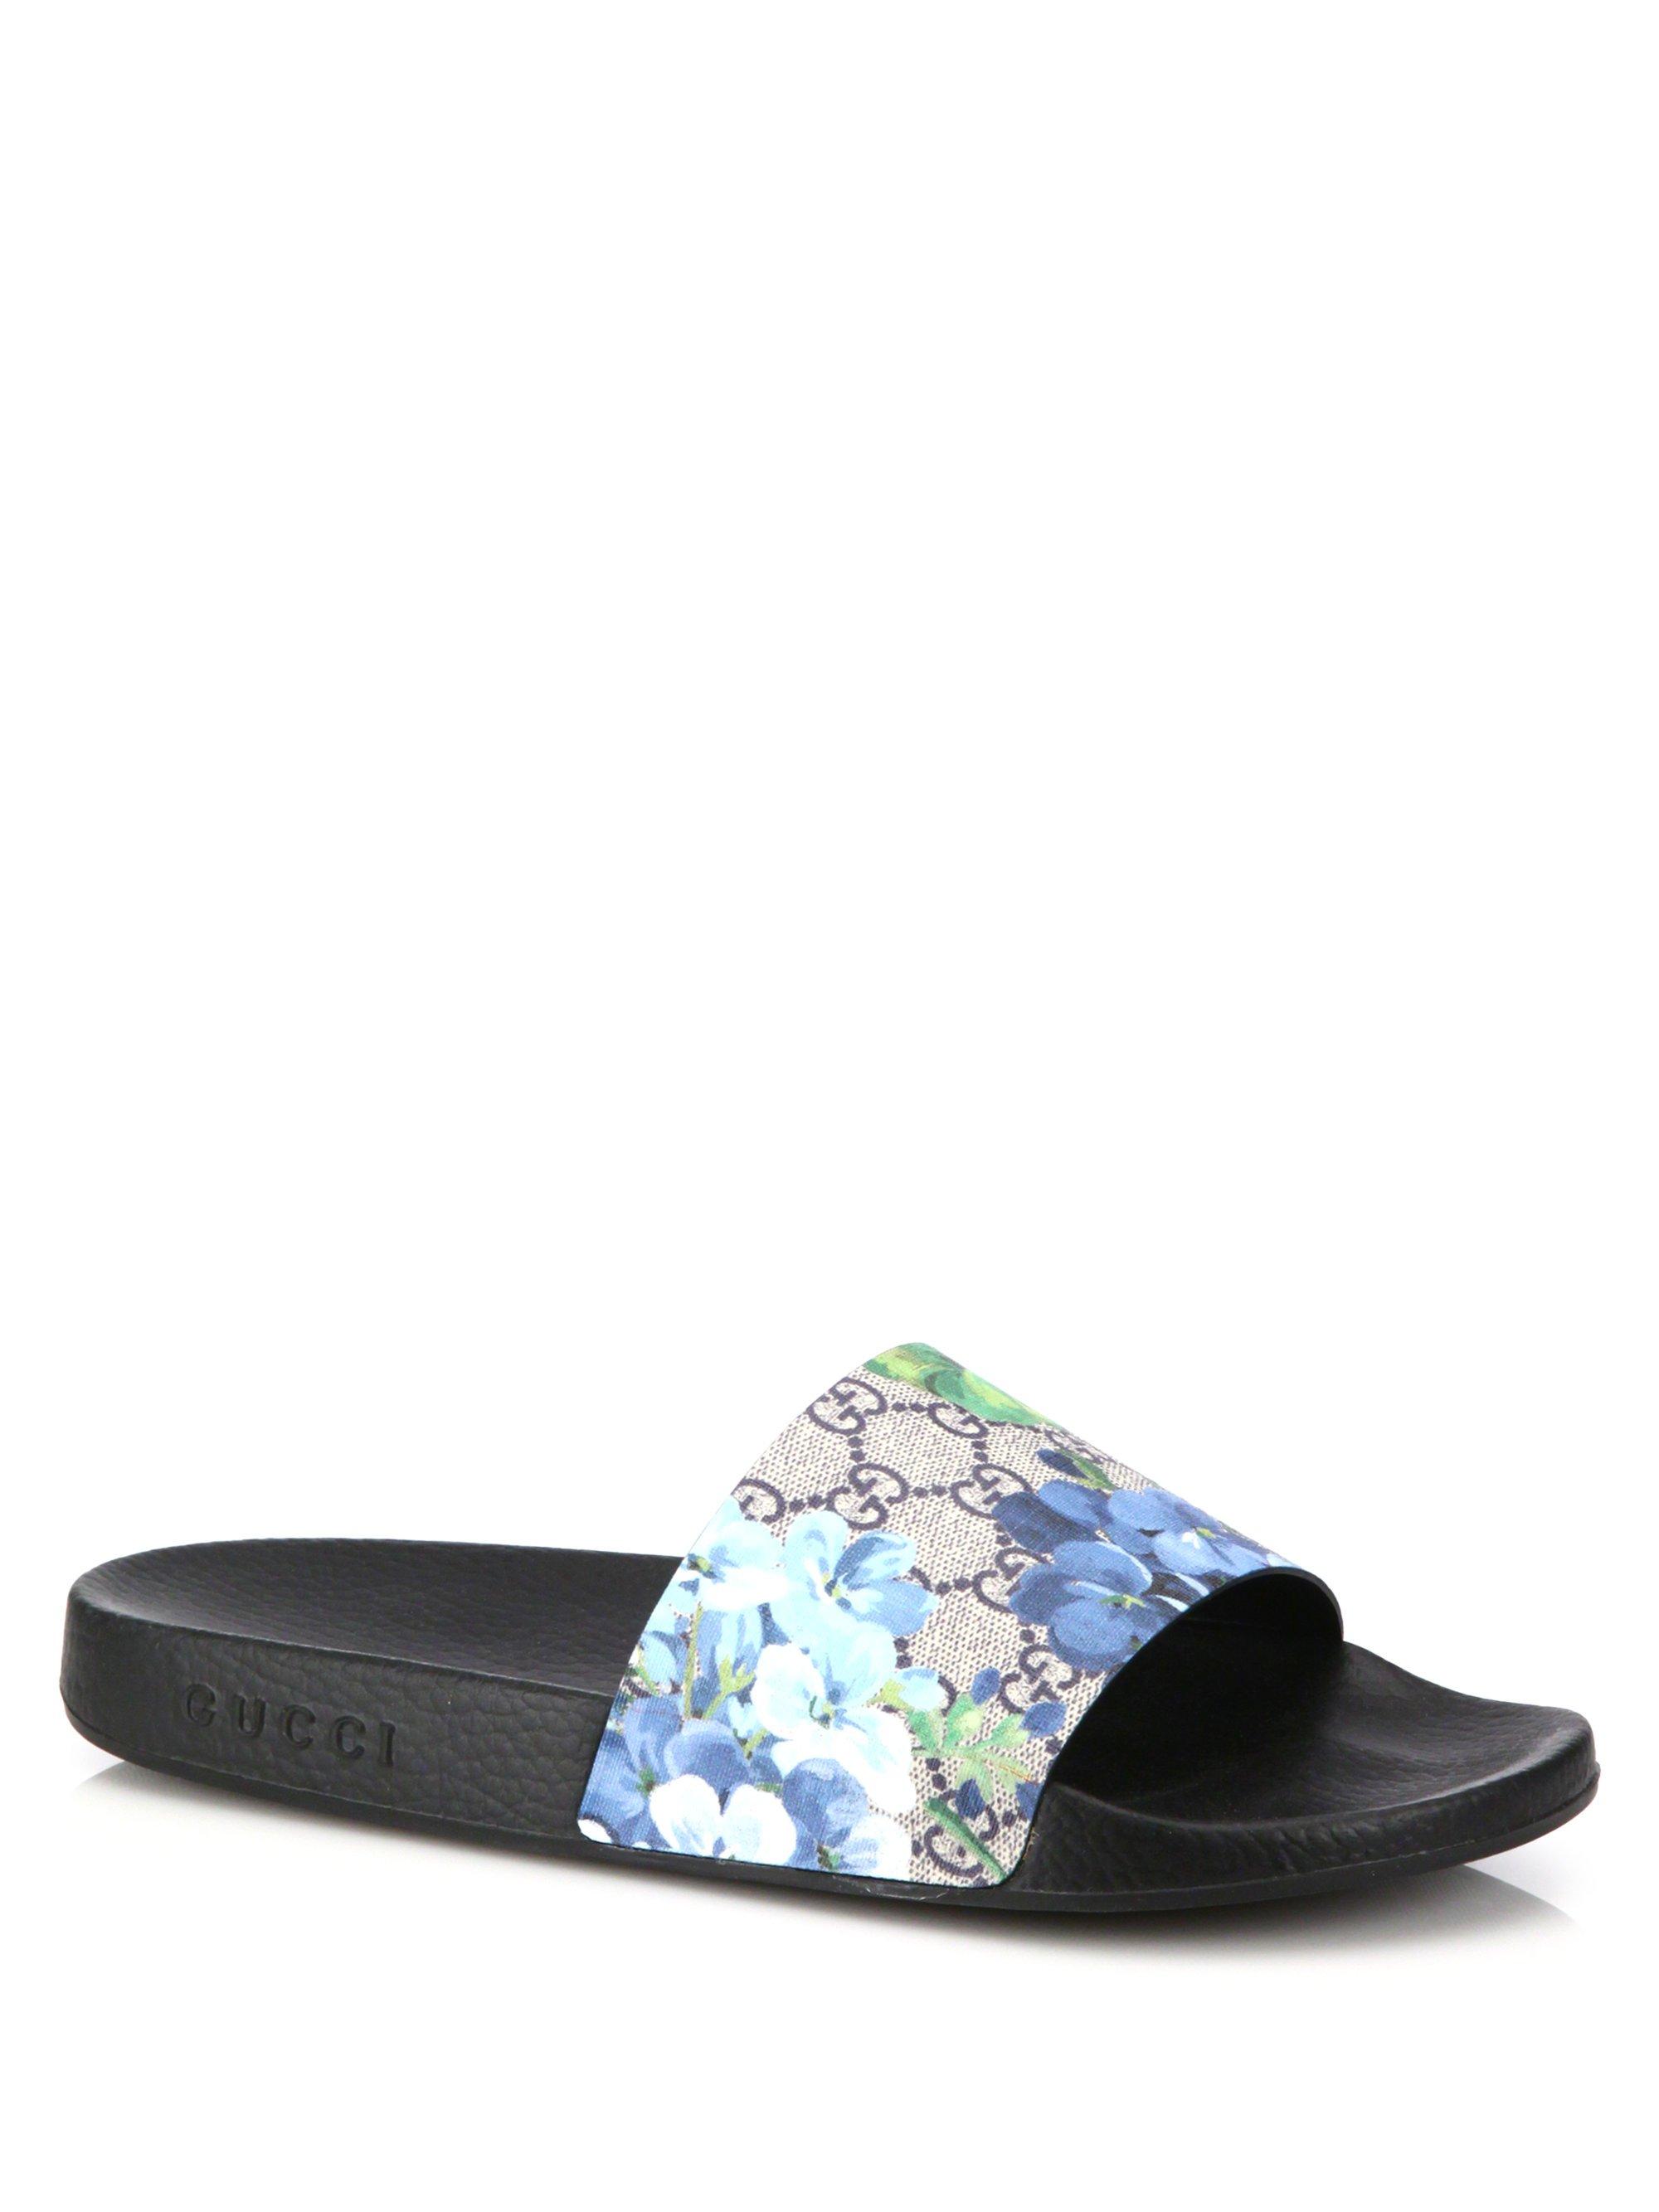 d547f8668f0 Authentic Gucci Bloom Slides